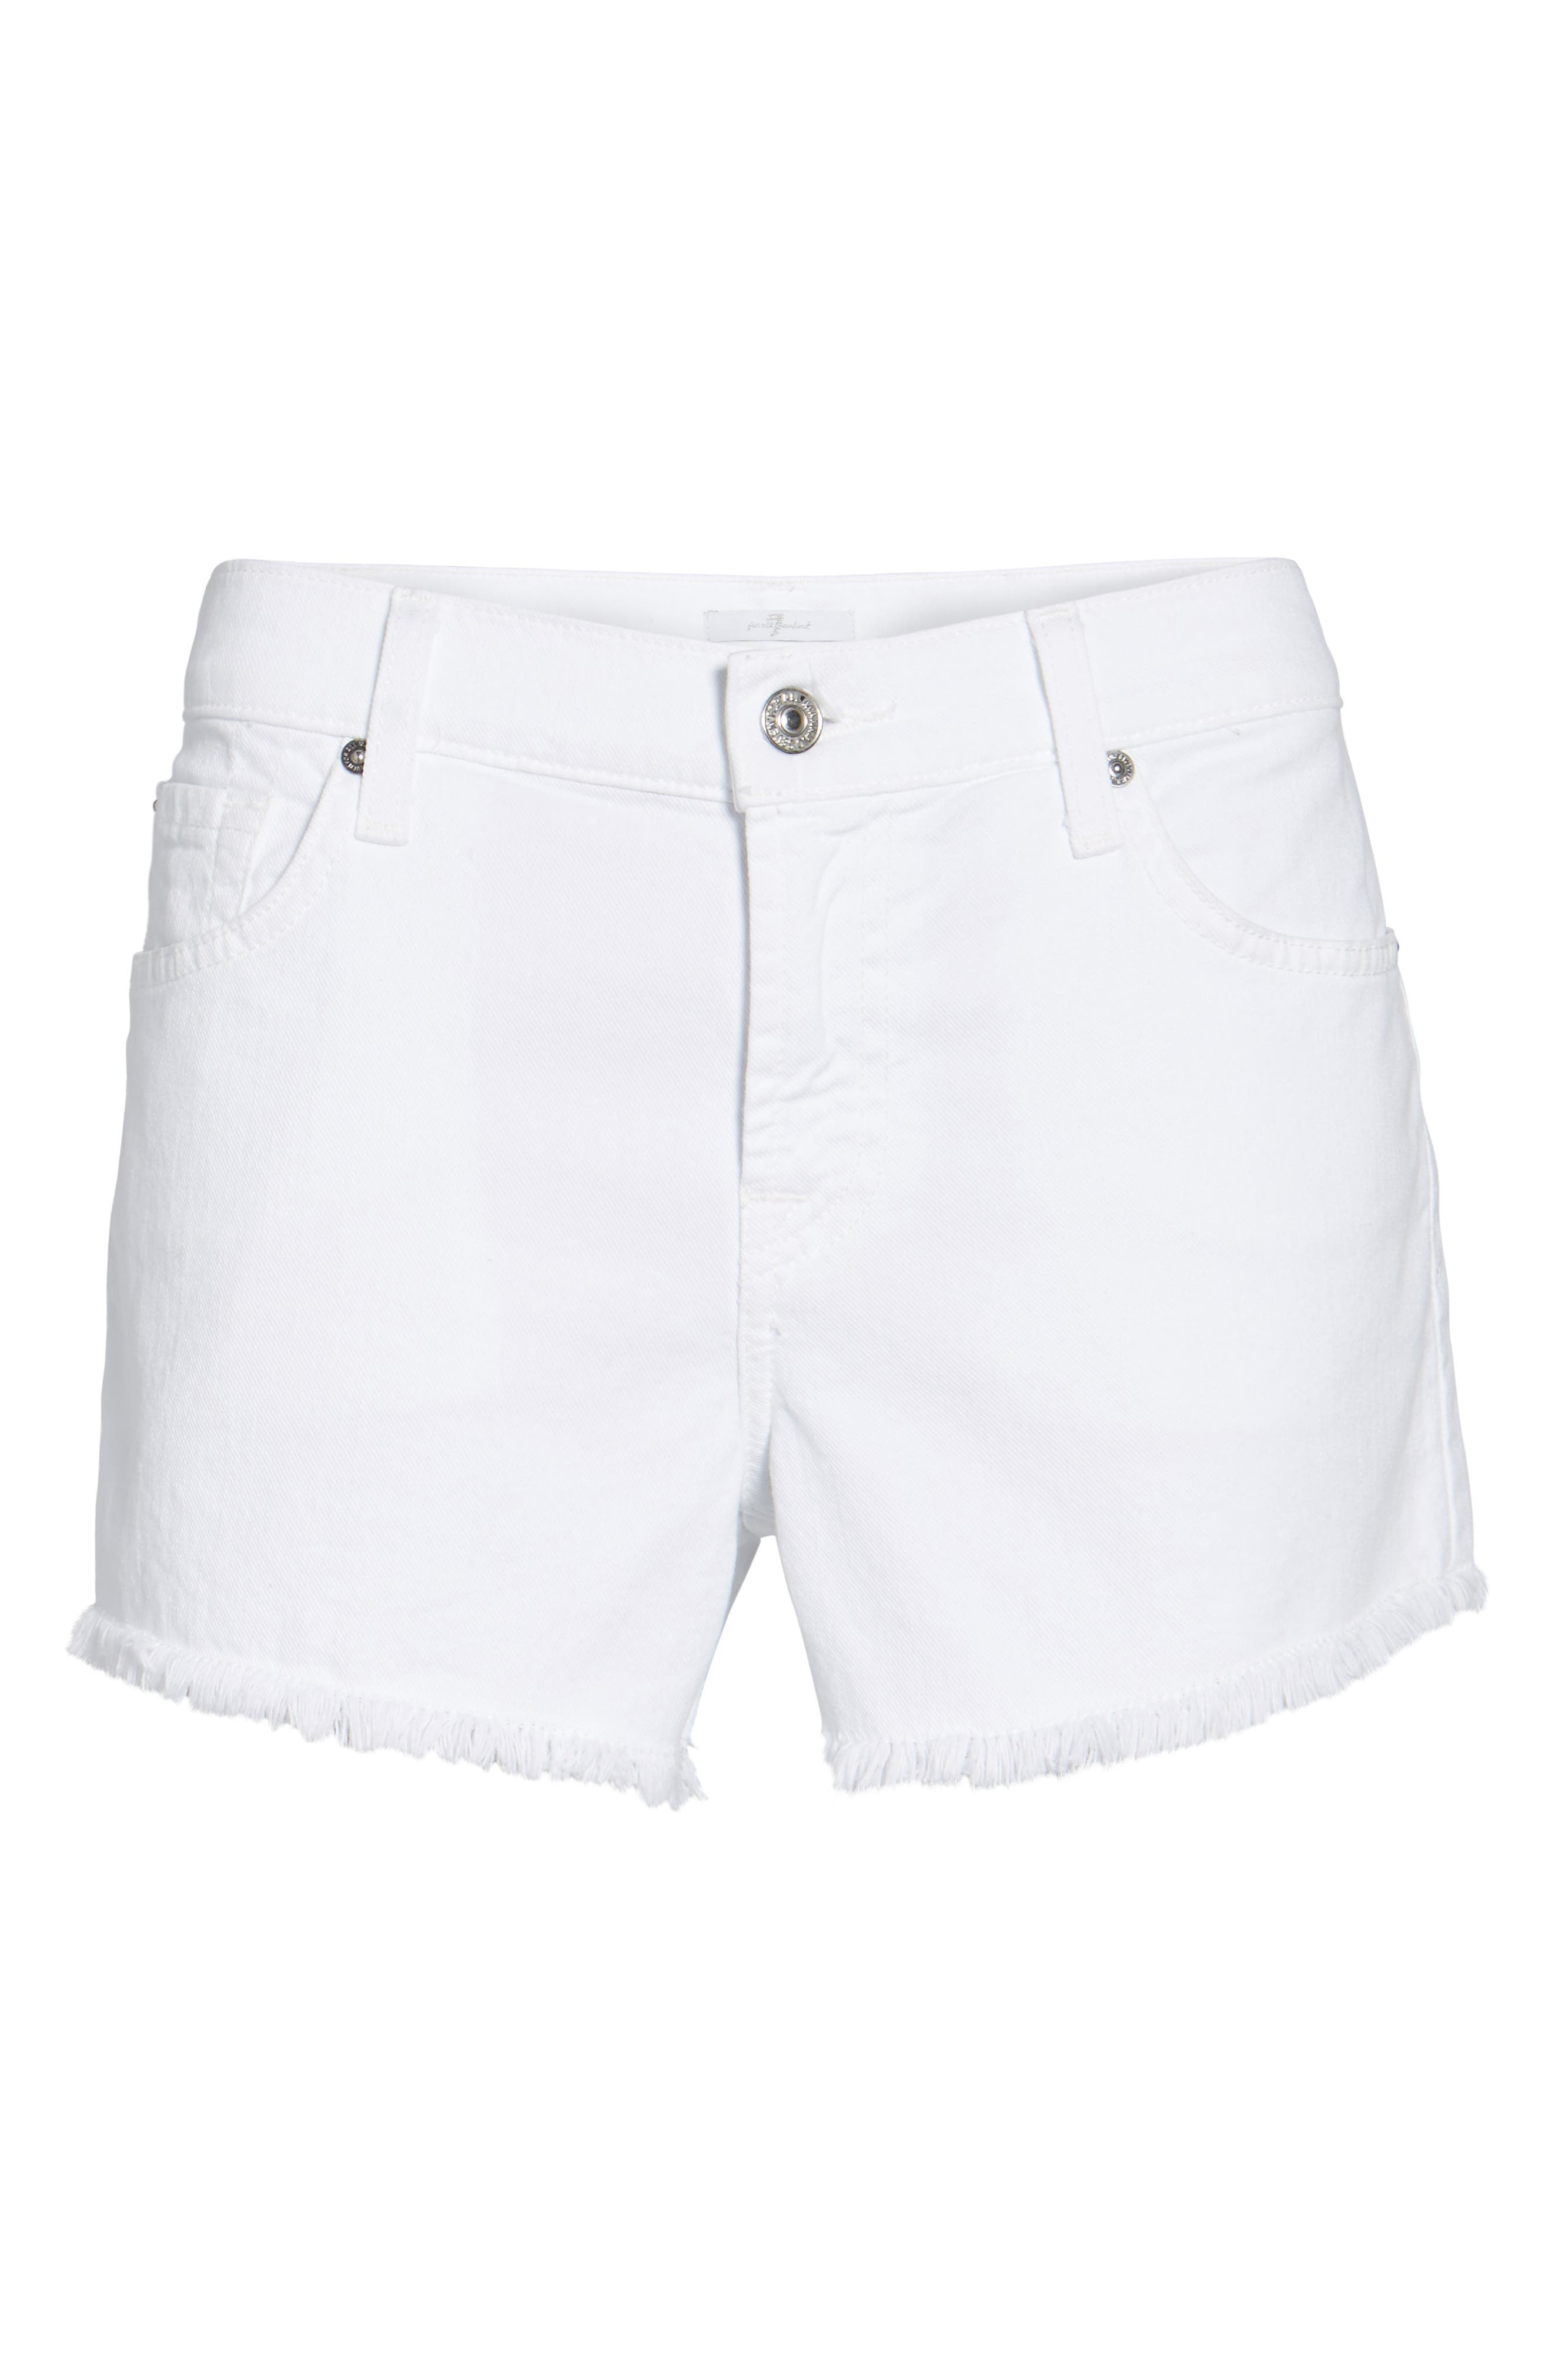 Cutoff Denim Shorts,                             Alternate thumbnail 7, color,                             CLEAN WHITE